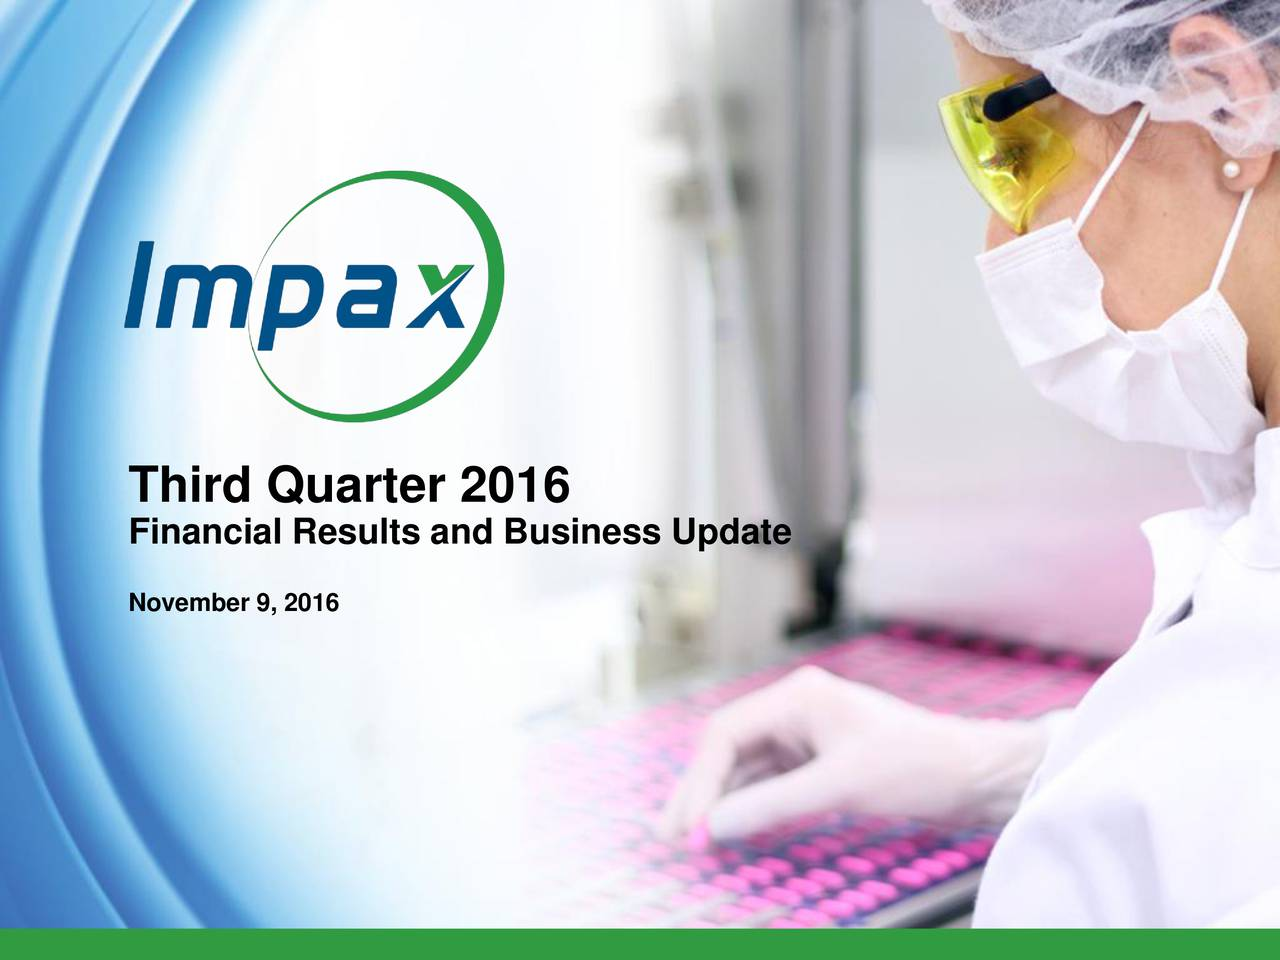 Impax Laboratories, Inc. 2016 Q3 - Results